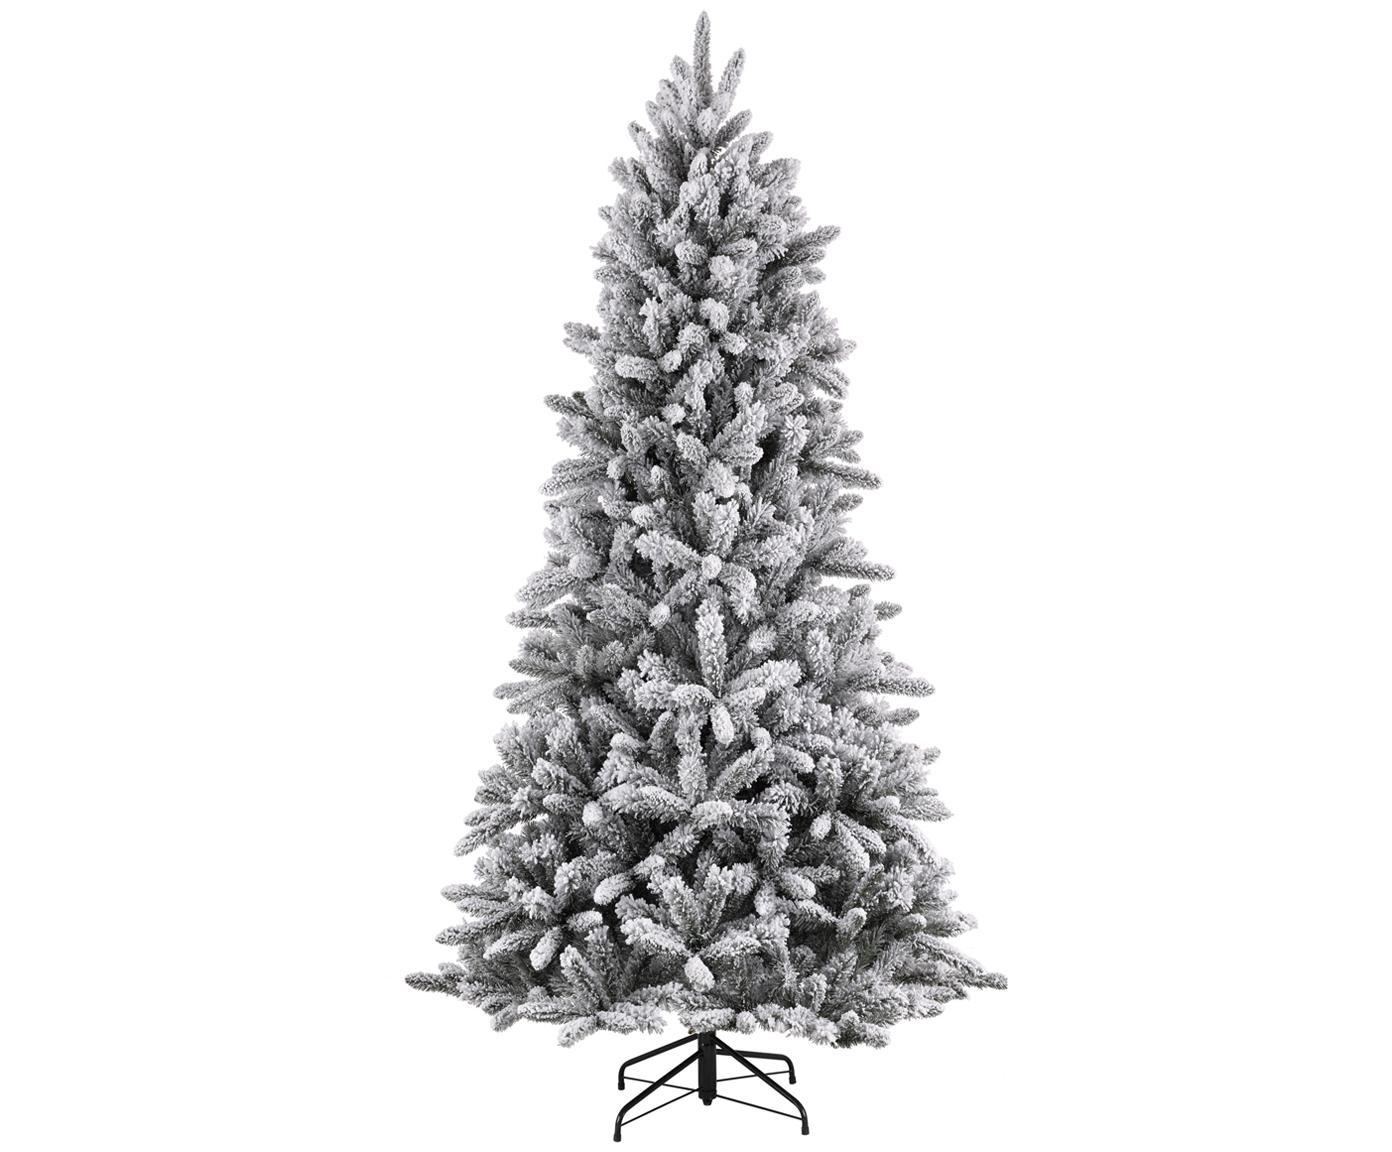 Decoratieve kerstboom Snowdon, Donkergroen, Ø 102 x H 155 cm